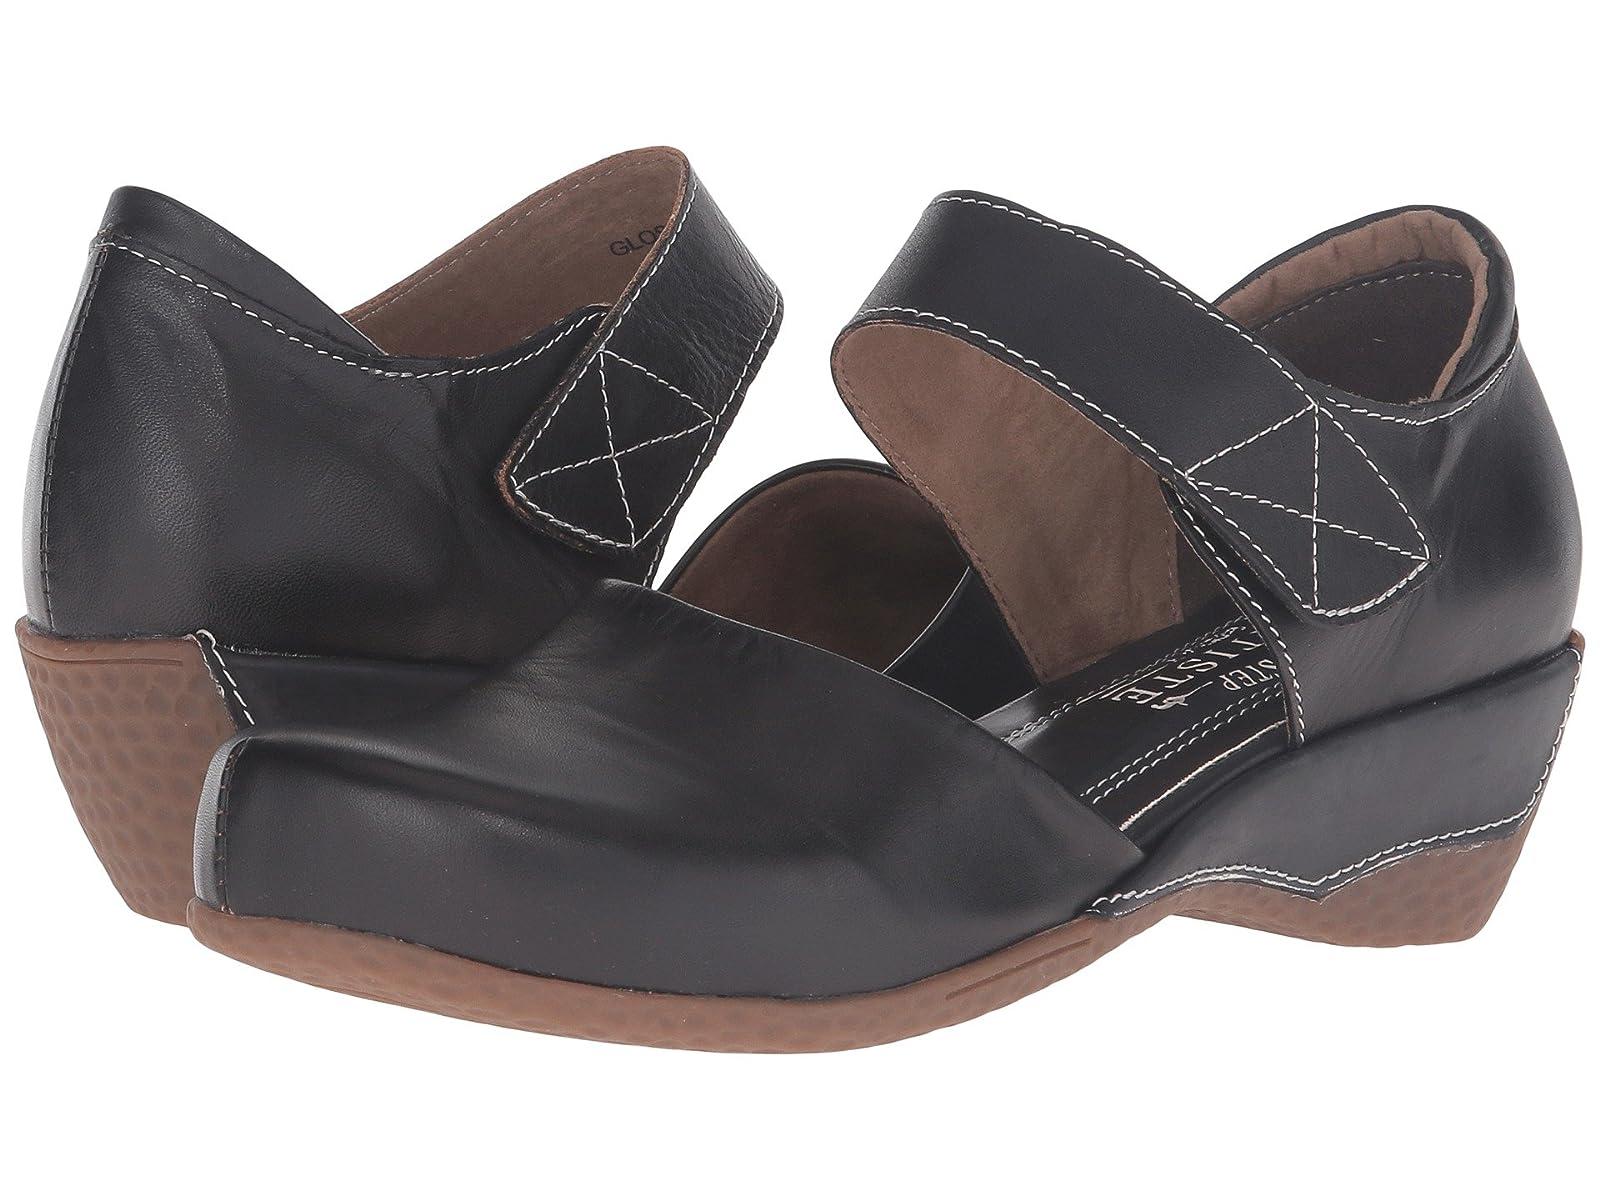 L'Artiste by Spring Step GlossAtmospheric grades have affordable shoes